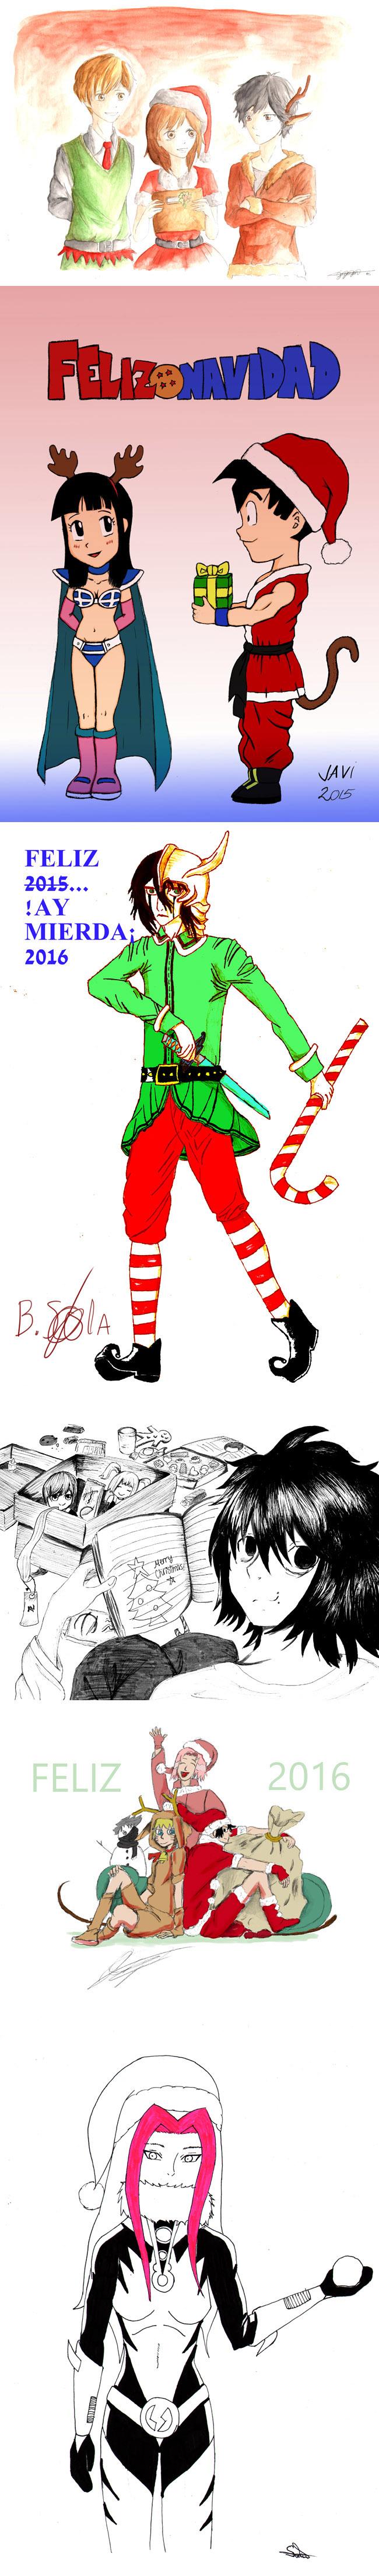 curso_comic_manga_fanarts_navidad_trabajos_alumnos_academiaC10_madrid_2